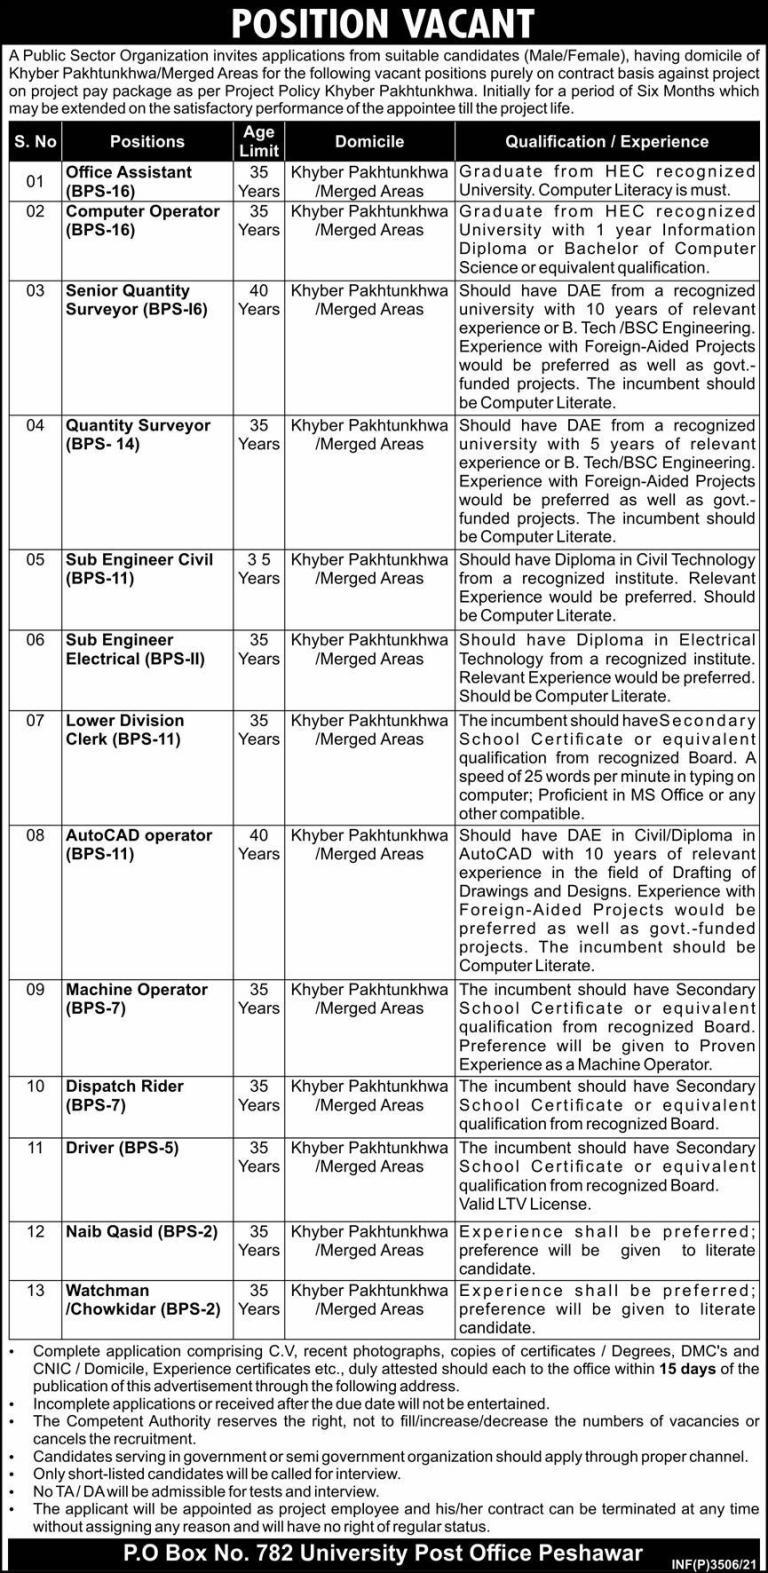 Public Sector Organization Peshawar Jobs 2021  PO Box 782